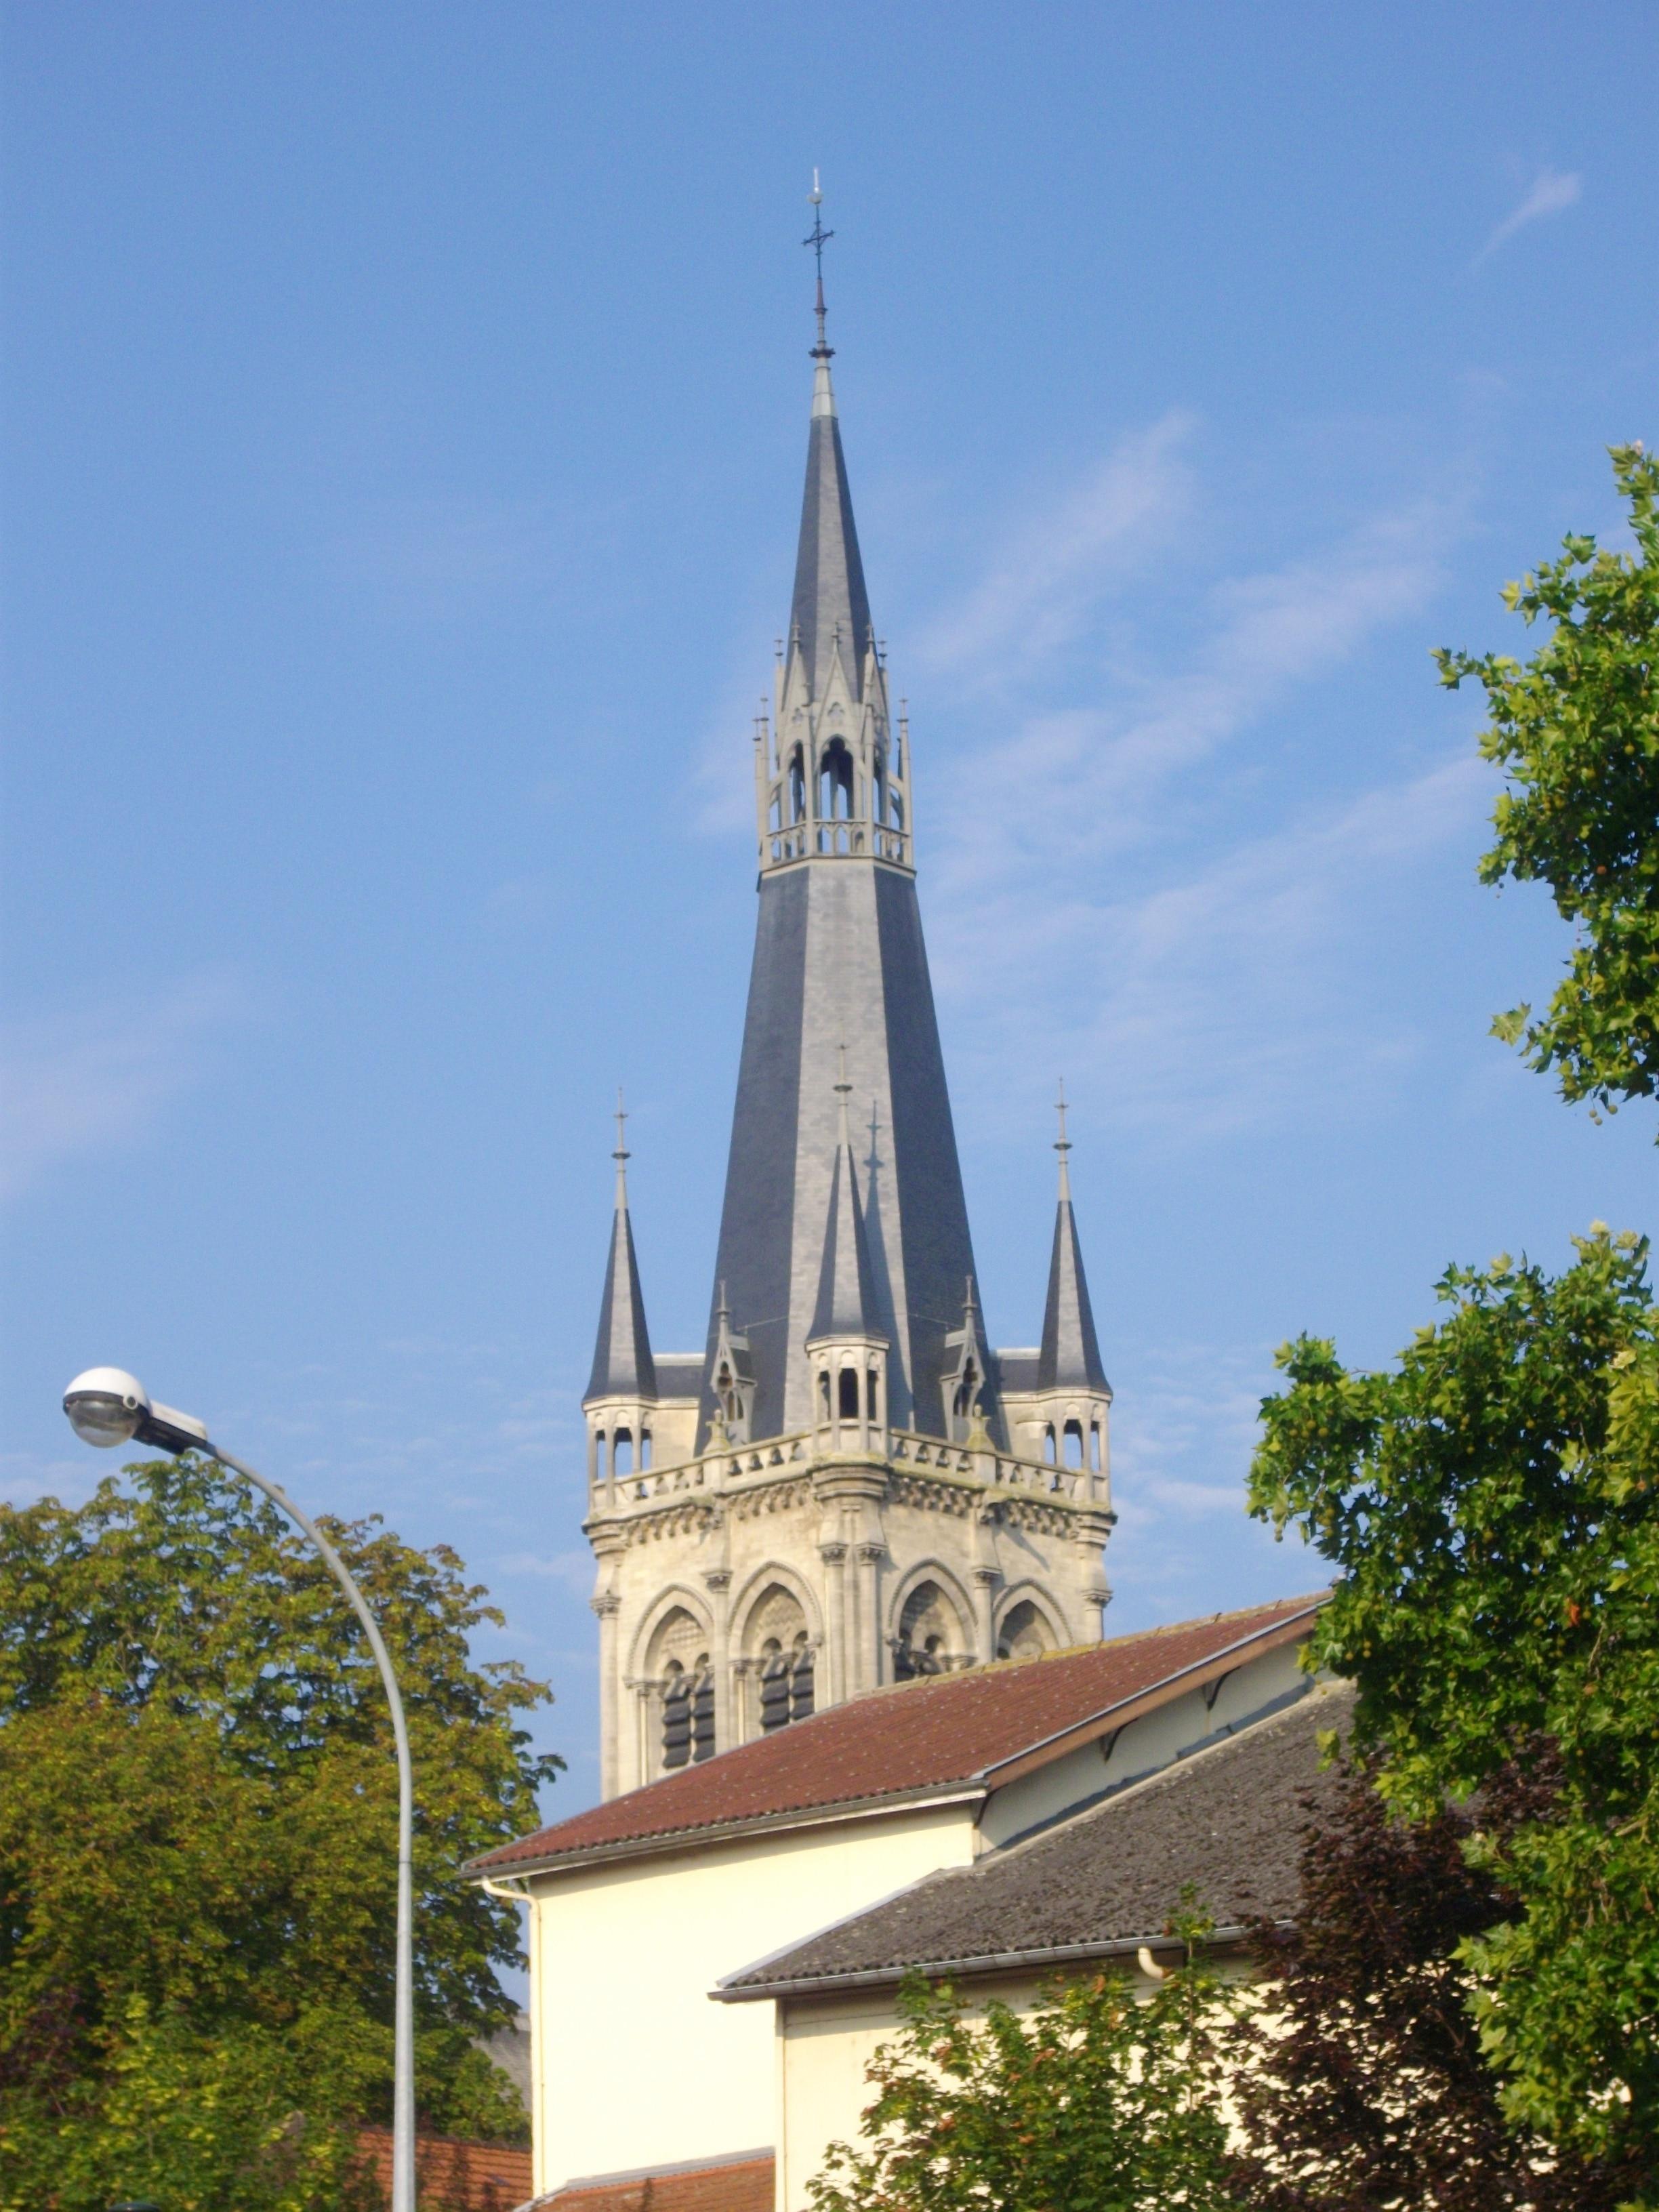 Epernay, Marne, France